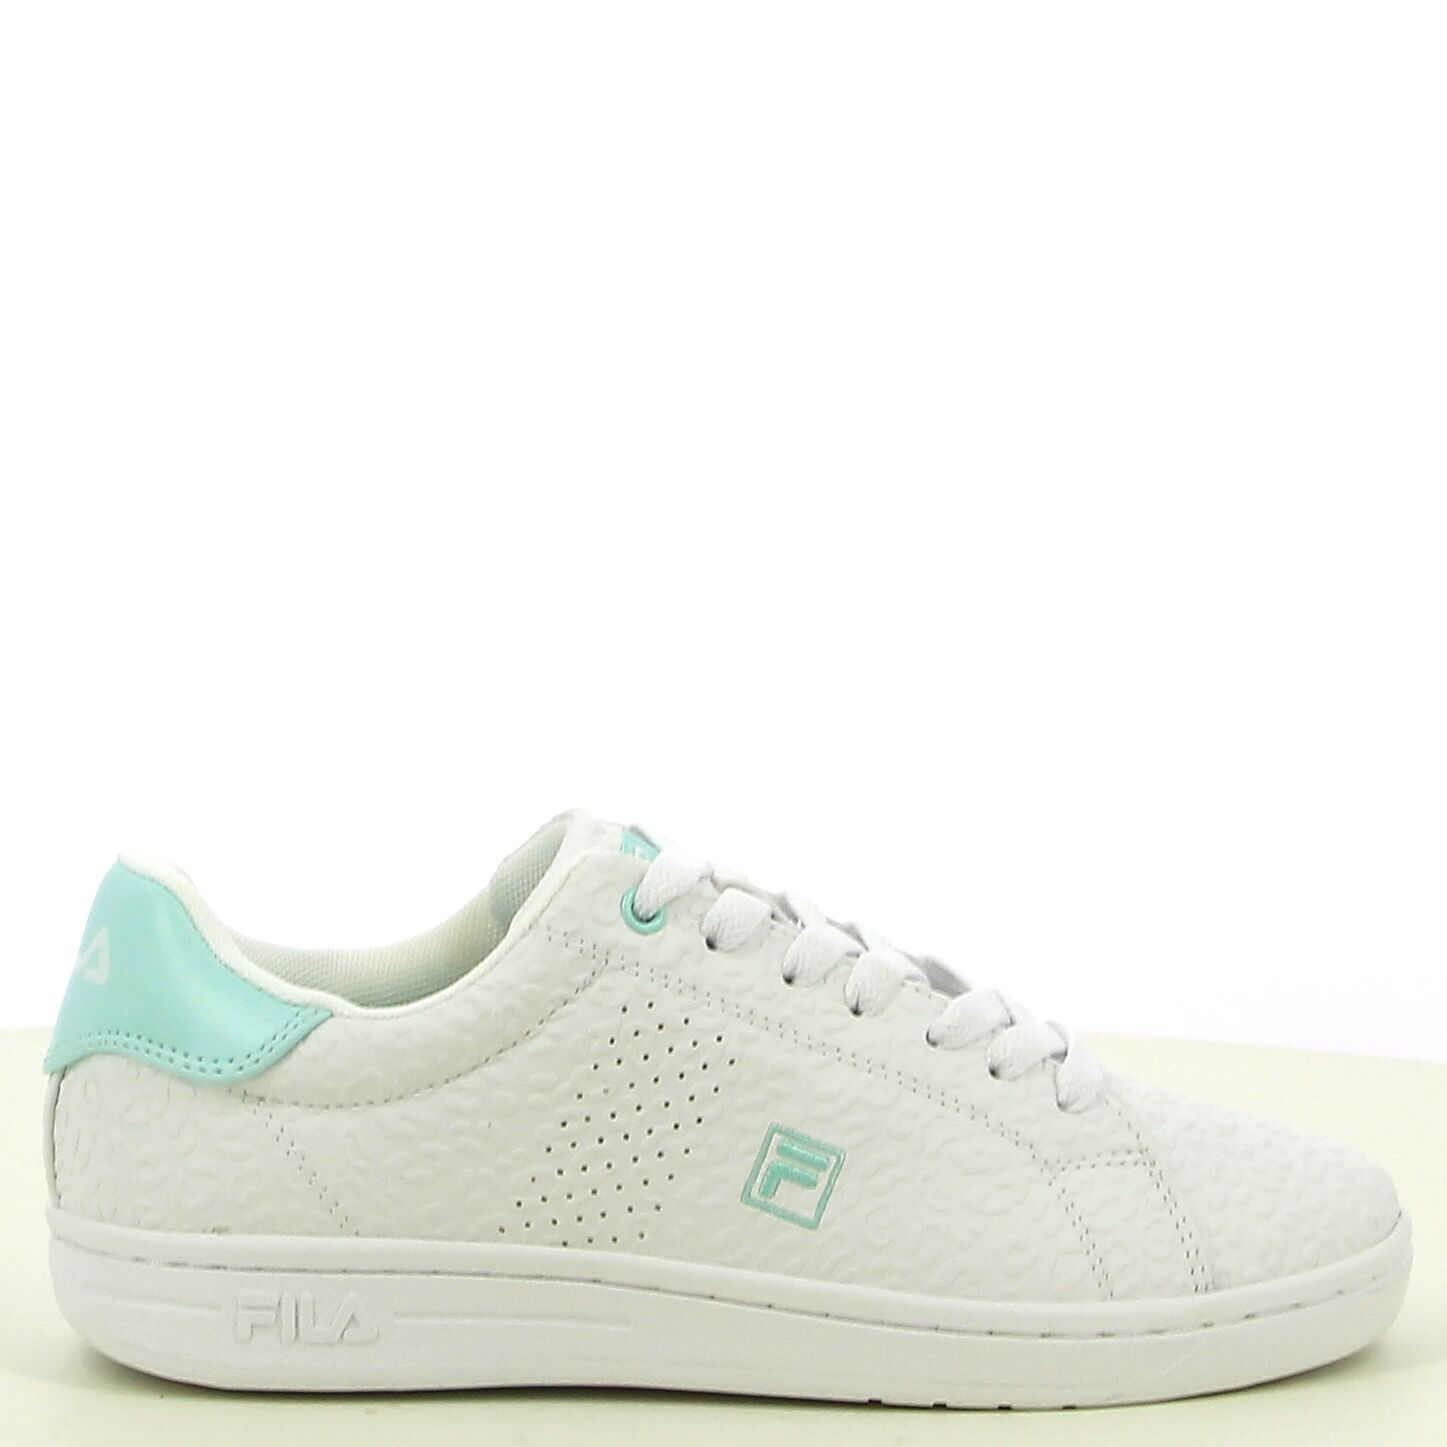 Fila - Baskets - Blanc